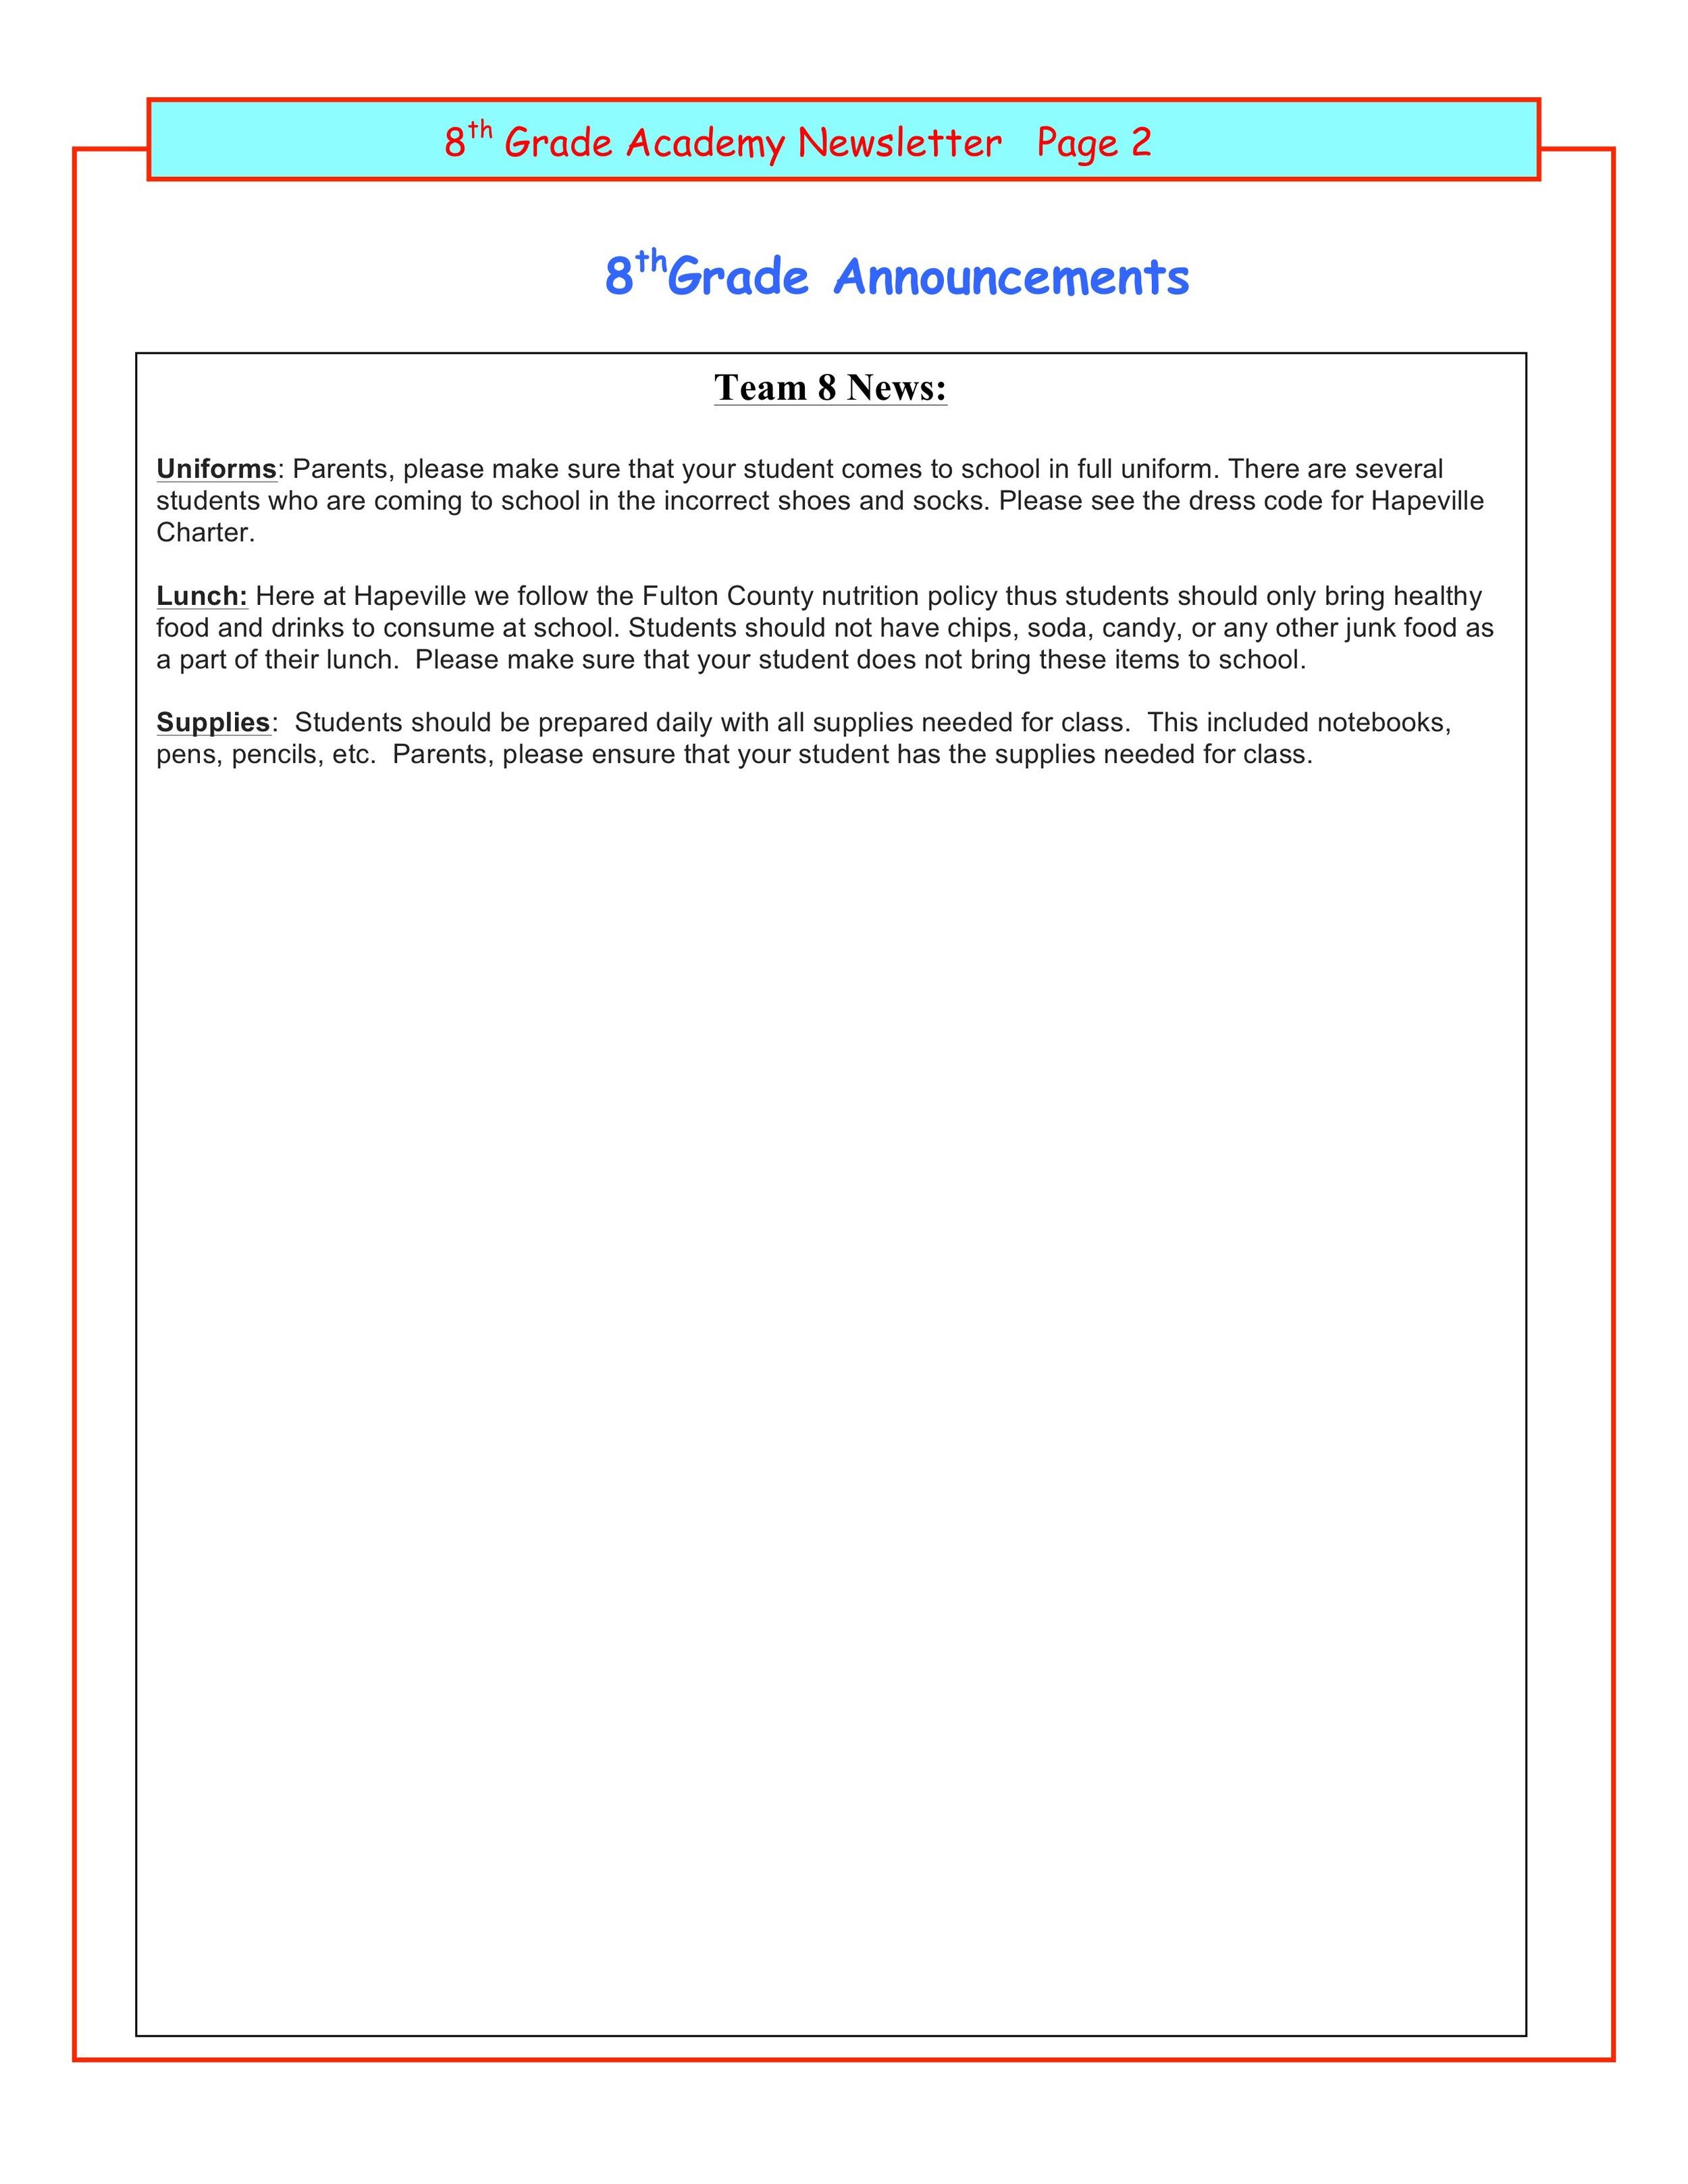 Newsletter Image8th grade 9-15-2014 2.jpeg